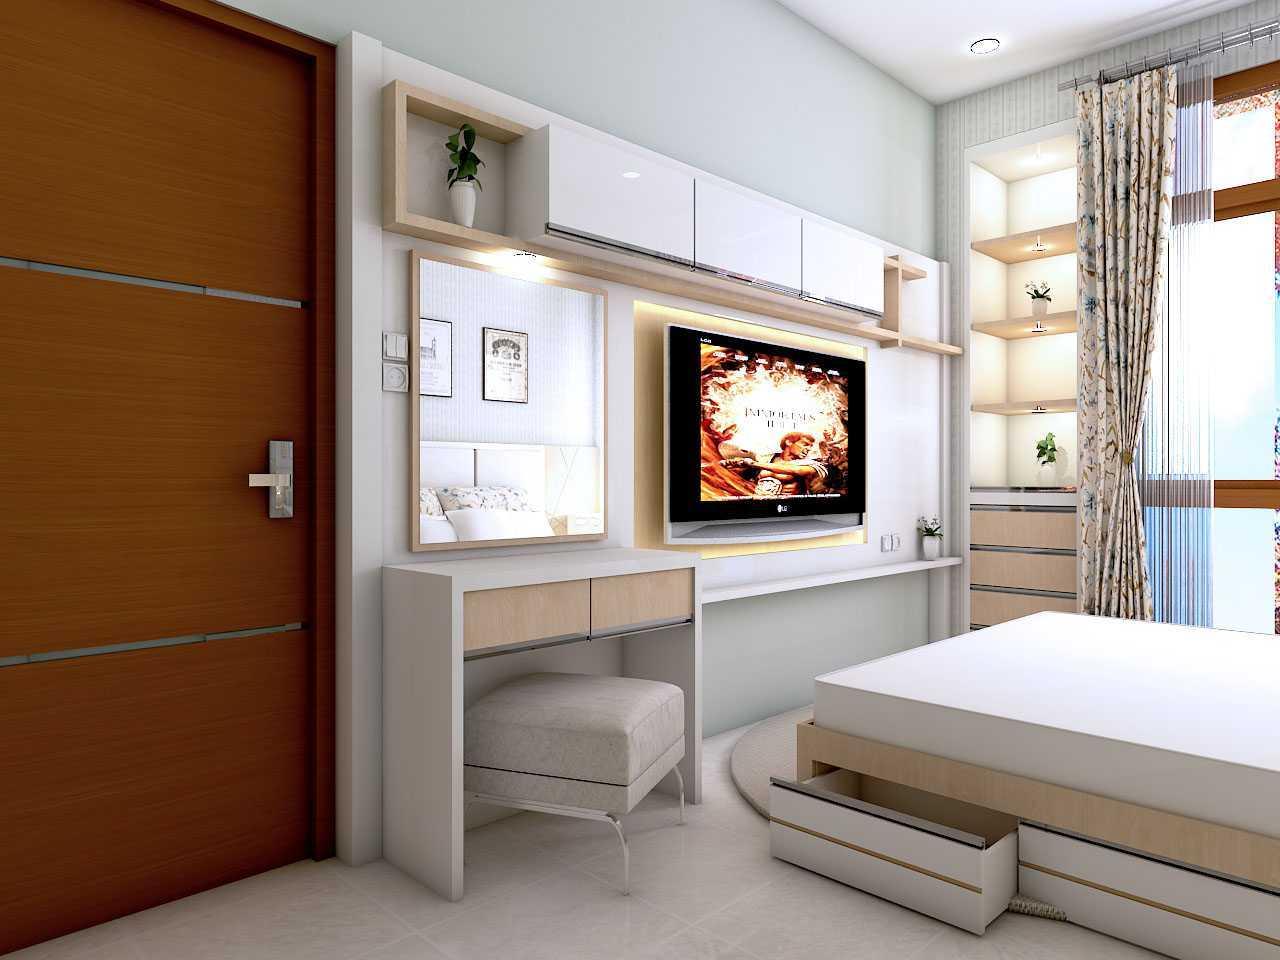 Arteta Interior Design & Furniture Master Bed Room Modern Minimalis Surakarta, Kota Surakarta, Jawa Tengah, Indonesia Surakarta, Kota Surakarta, Jawa Tengah, Indonesia Bedroom   41190